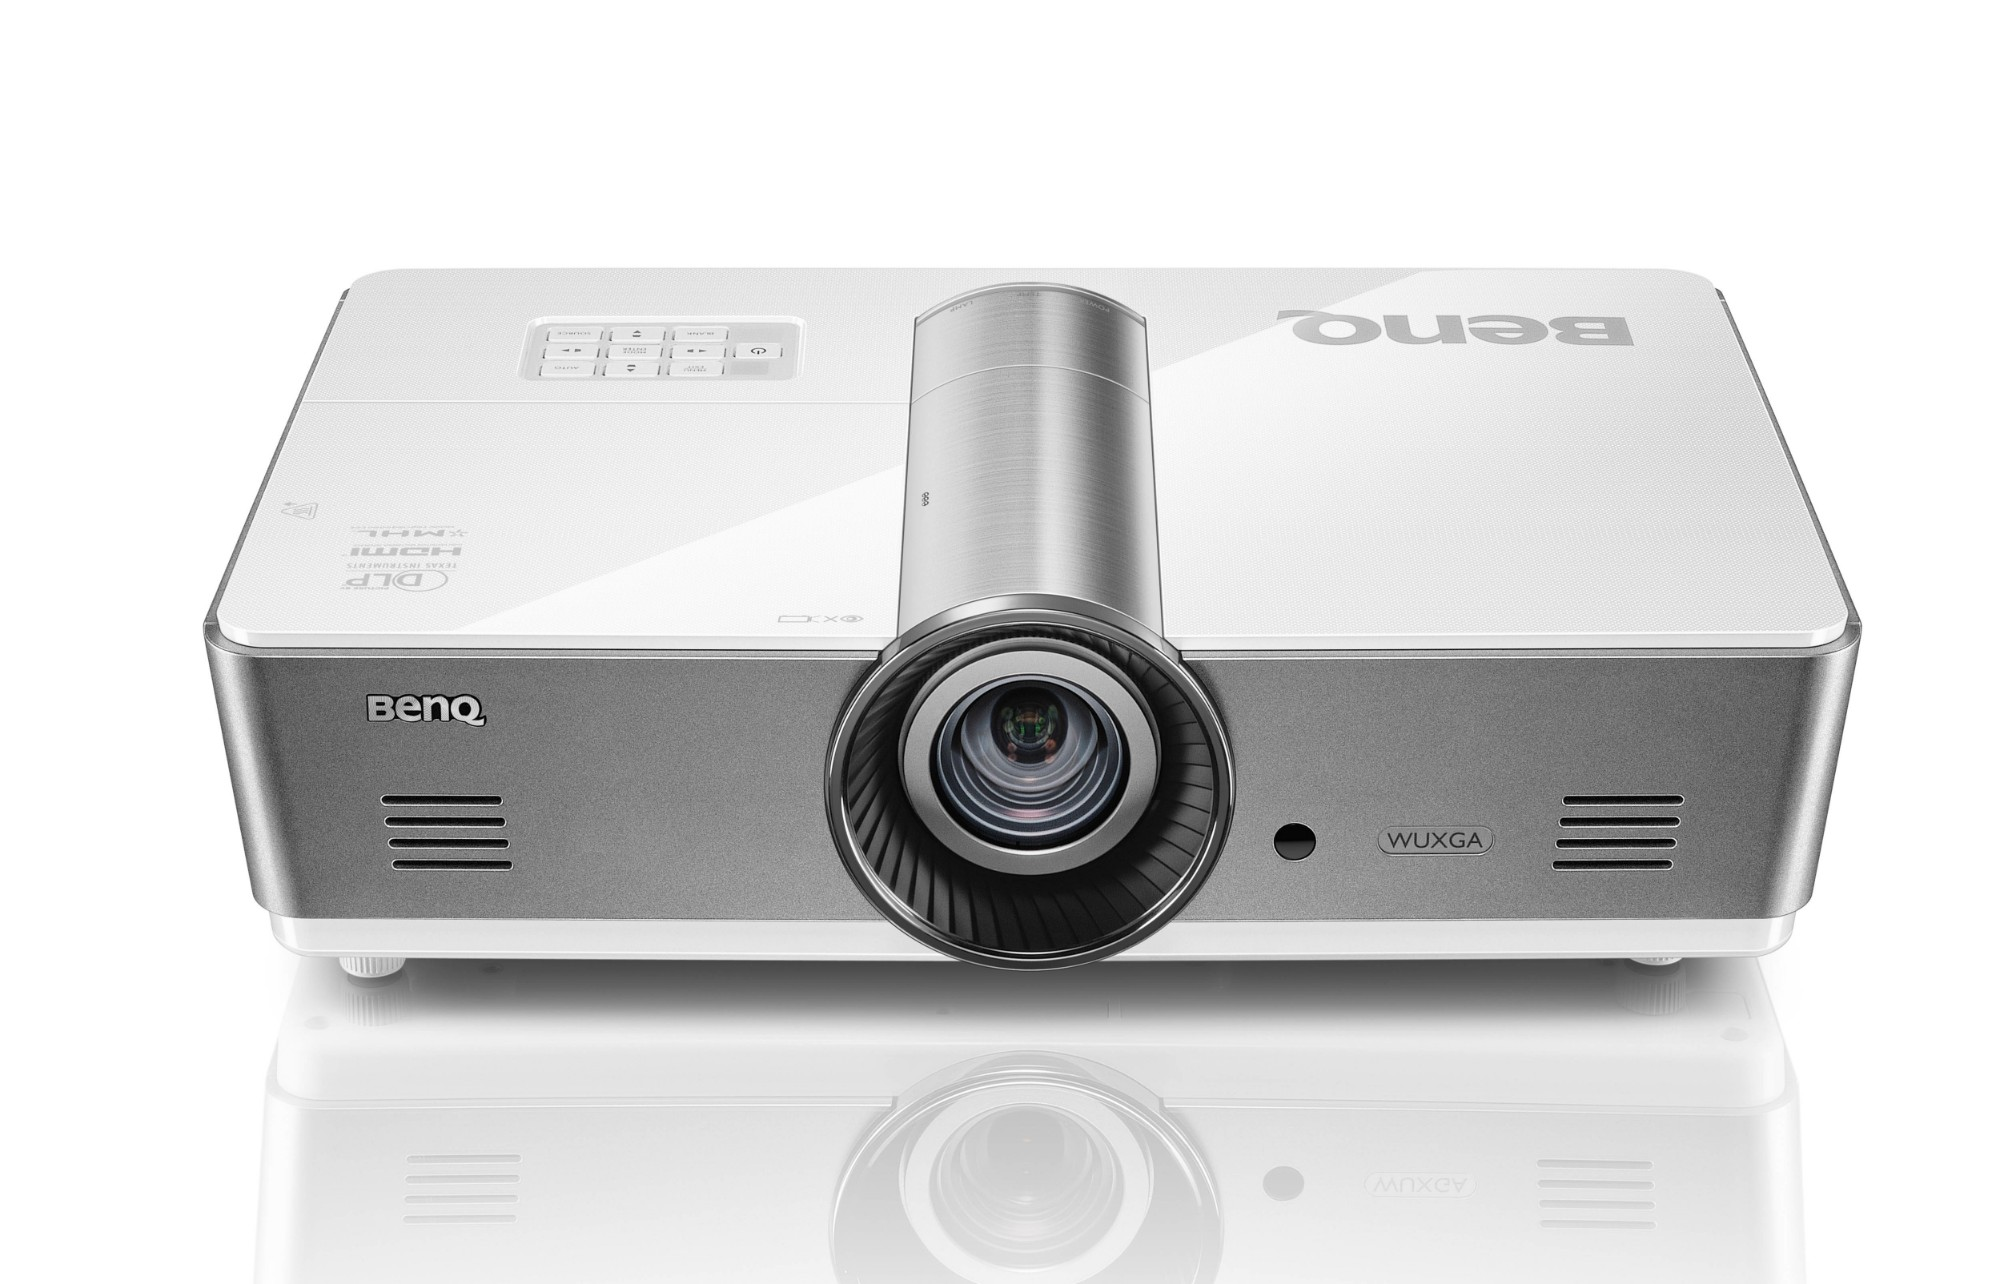 Benq SU922 Desktop projector 5000ANSI lumens DLP WUXGA (1920x1200) 3D Grey, White data projector